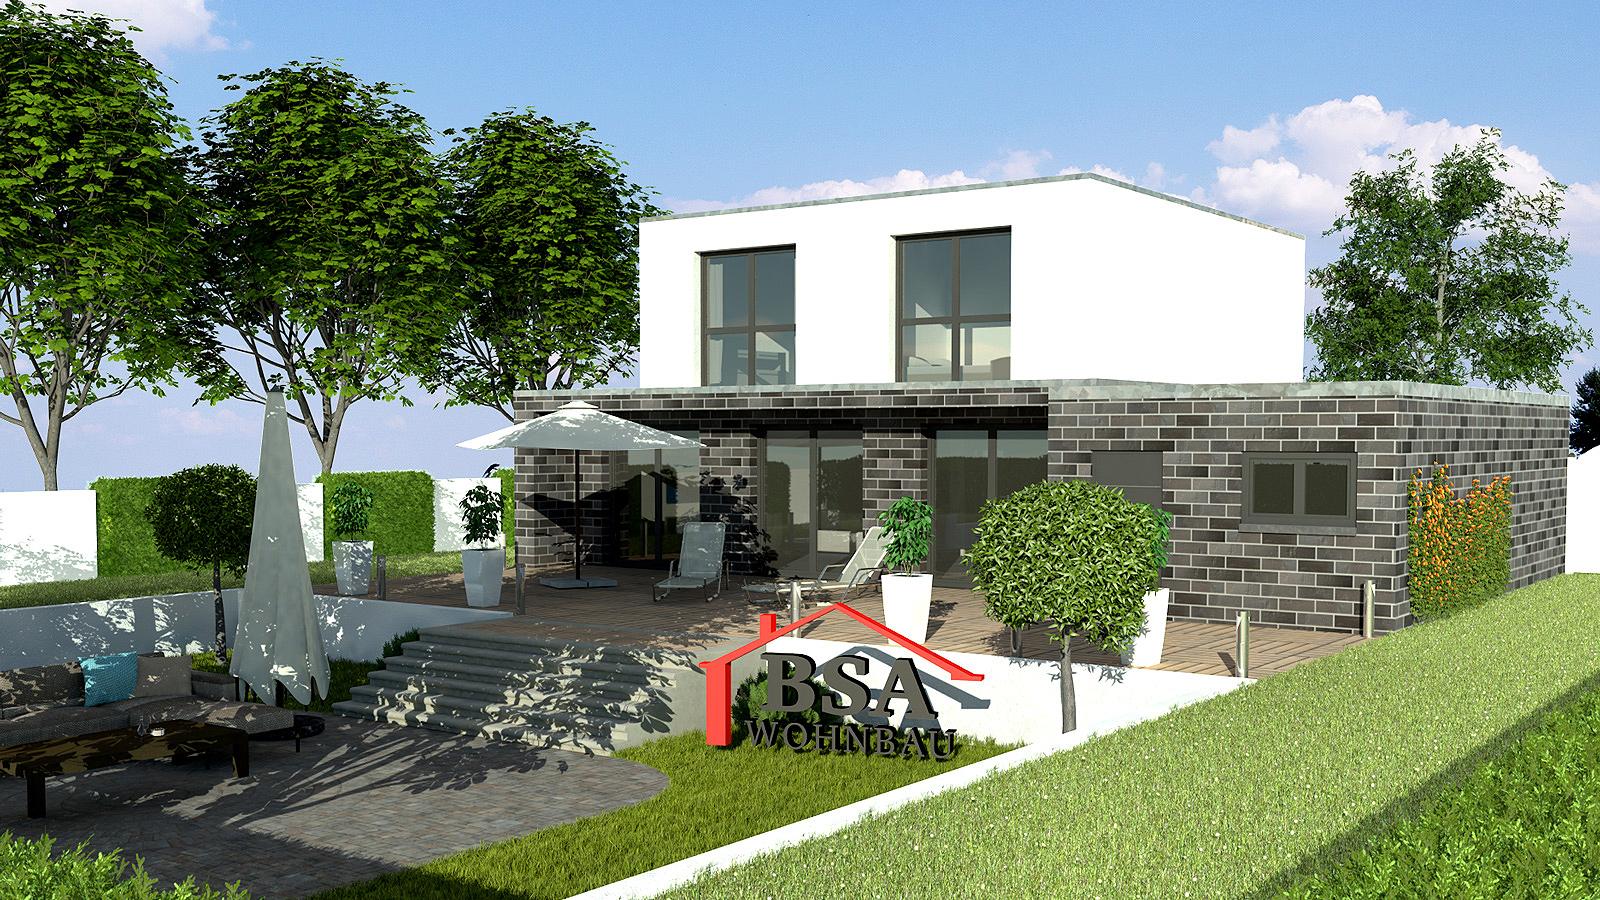 cube 142 kreatives bauhausstil haus bsa wohnbau bautr ger generalunternehmer. Black Bedroom Furniture Sets. Home Design Ideas